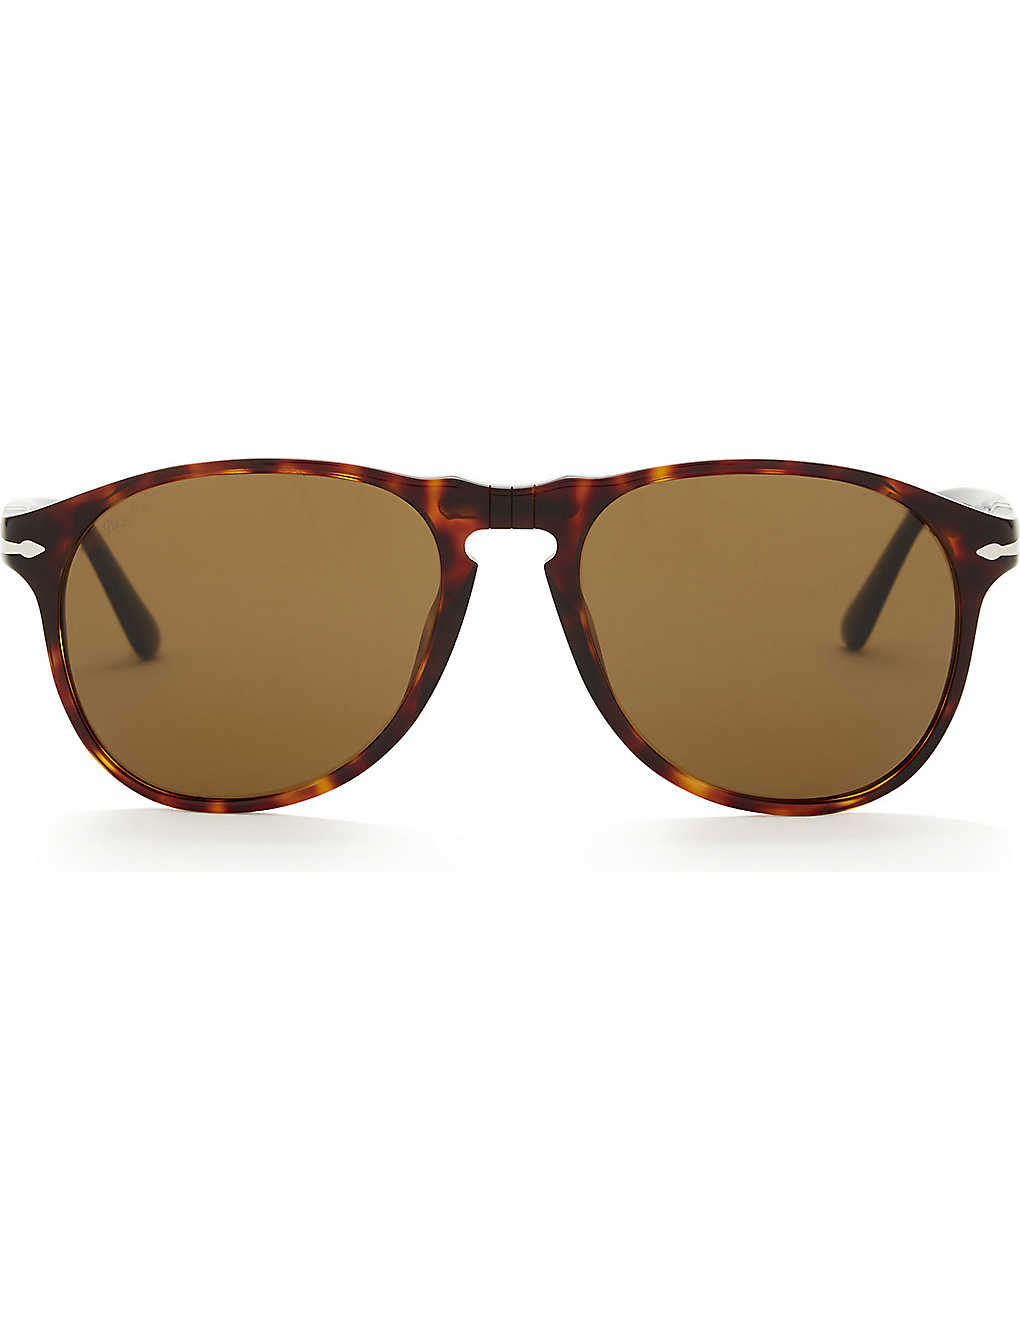 5f6e2e4fde Po6649s aviator sunglasses - Havana ...